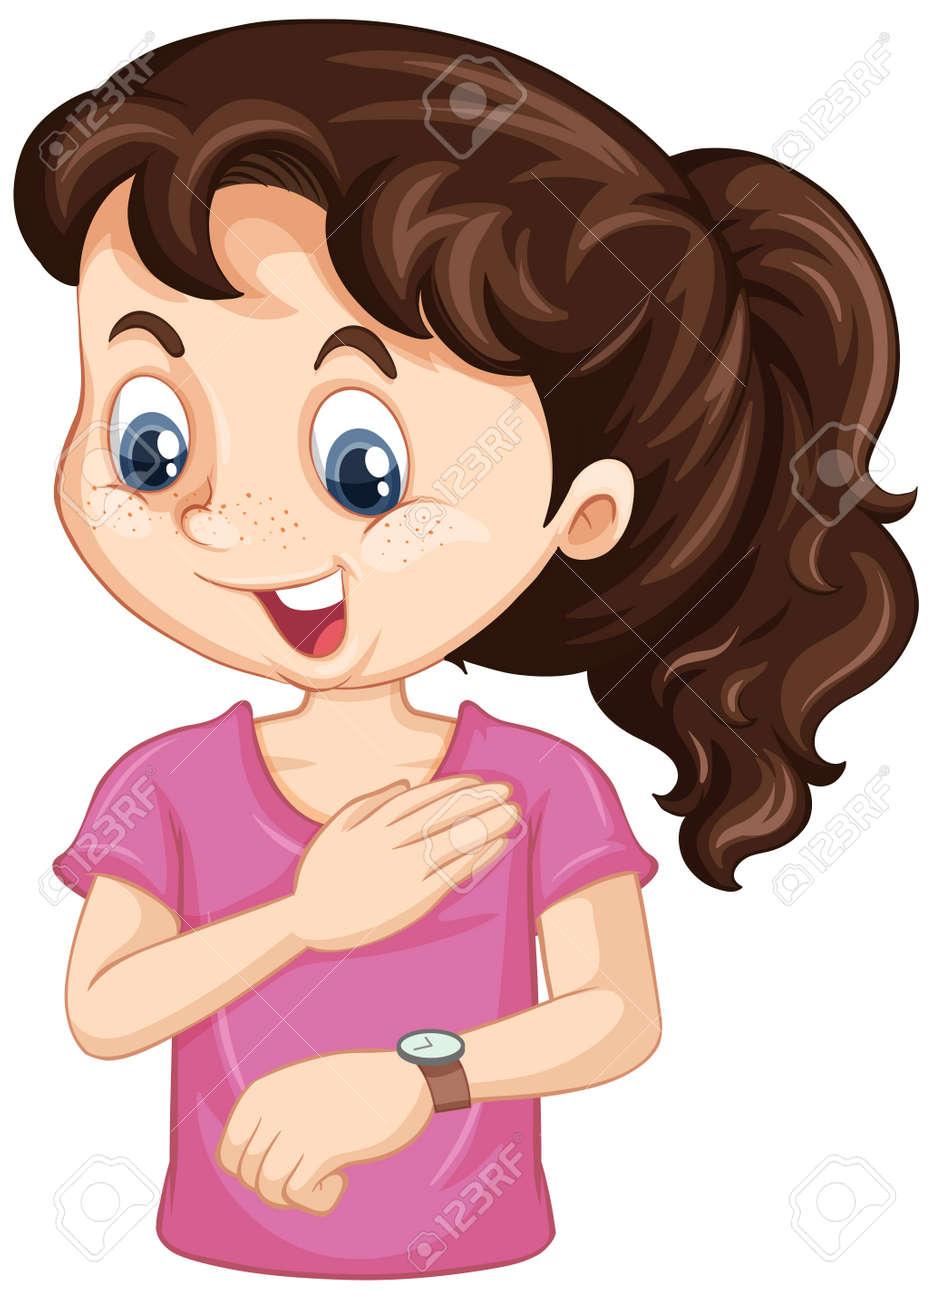 Girl cartoon character looking at wrist watch illustration - 167725983